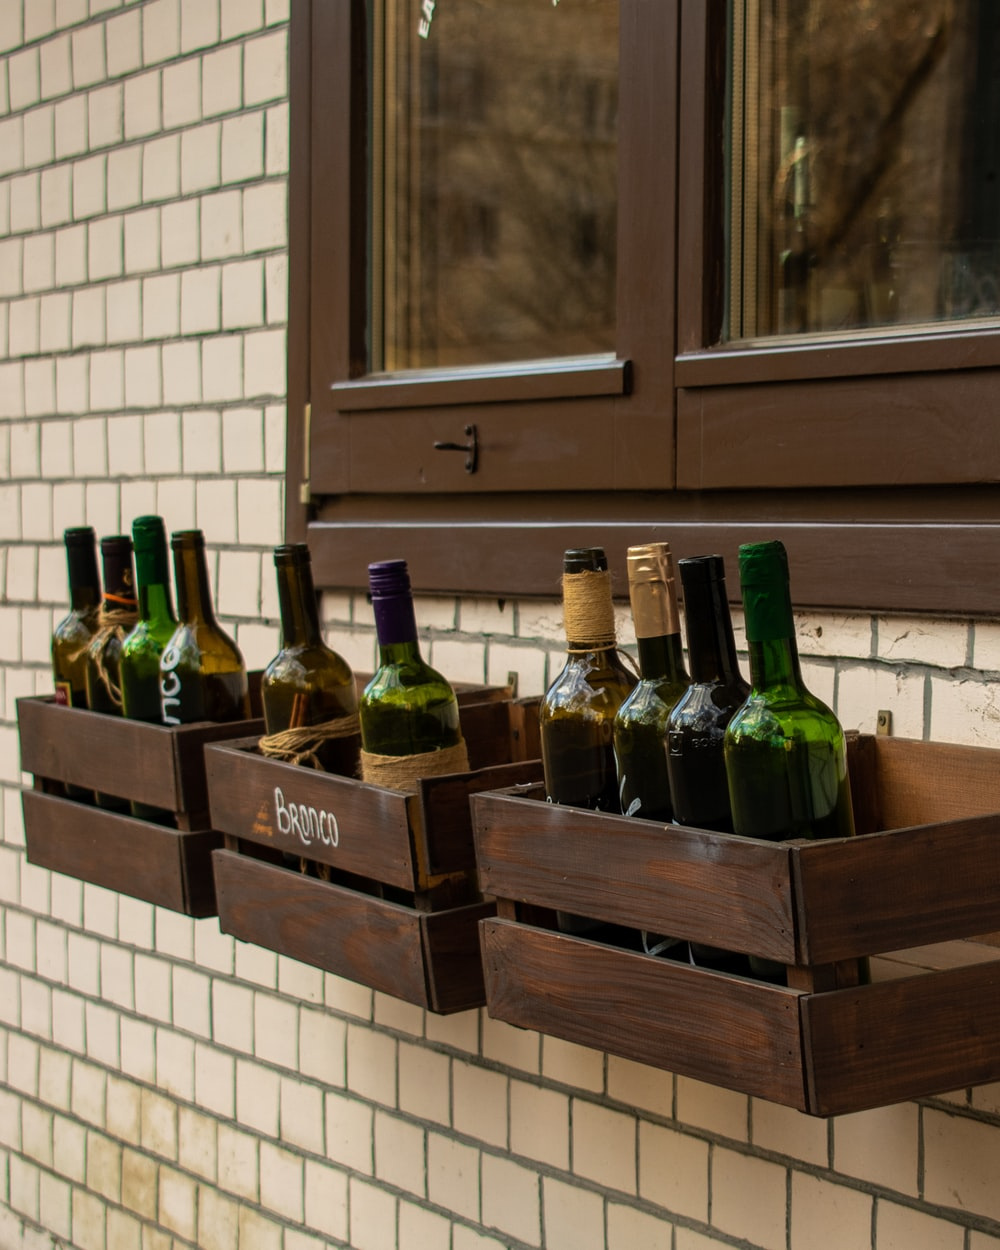 green glass bottles on brown wooden shelf